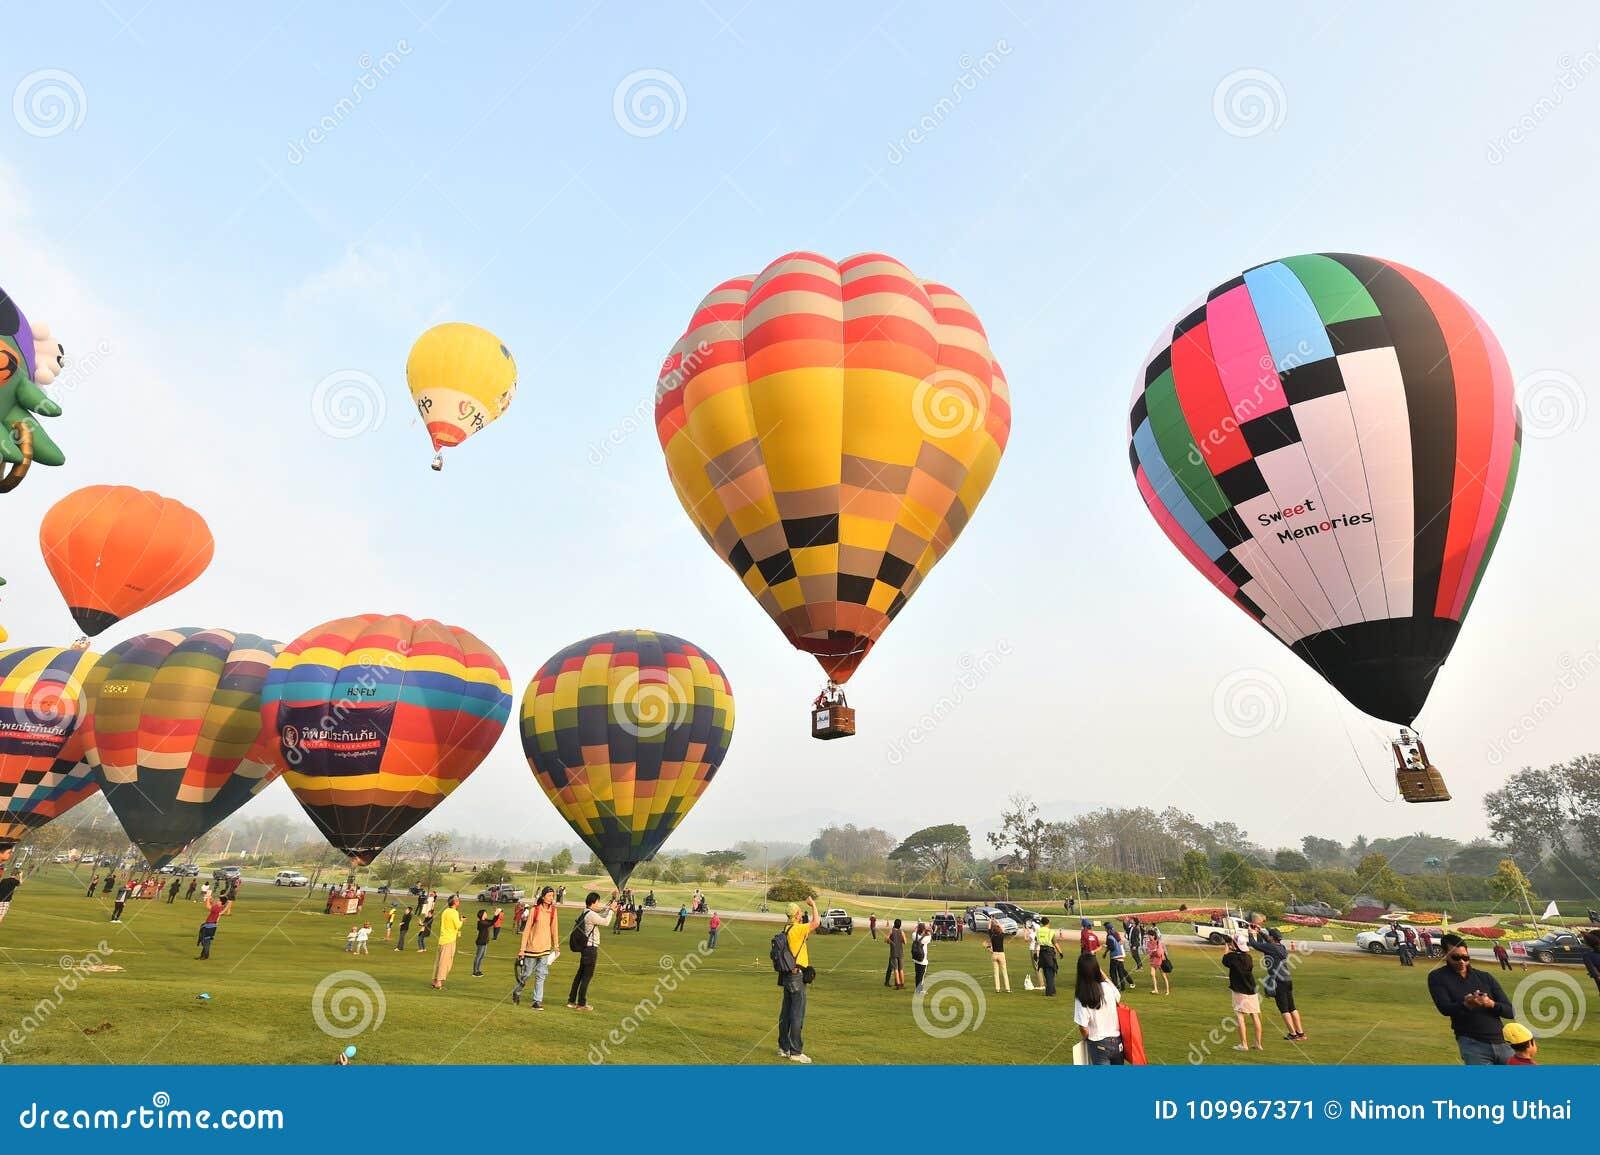 singha park international balloon fiesta editorial photo image of